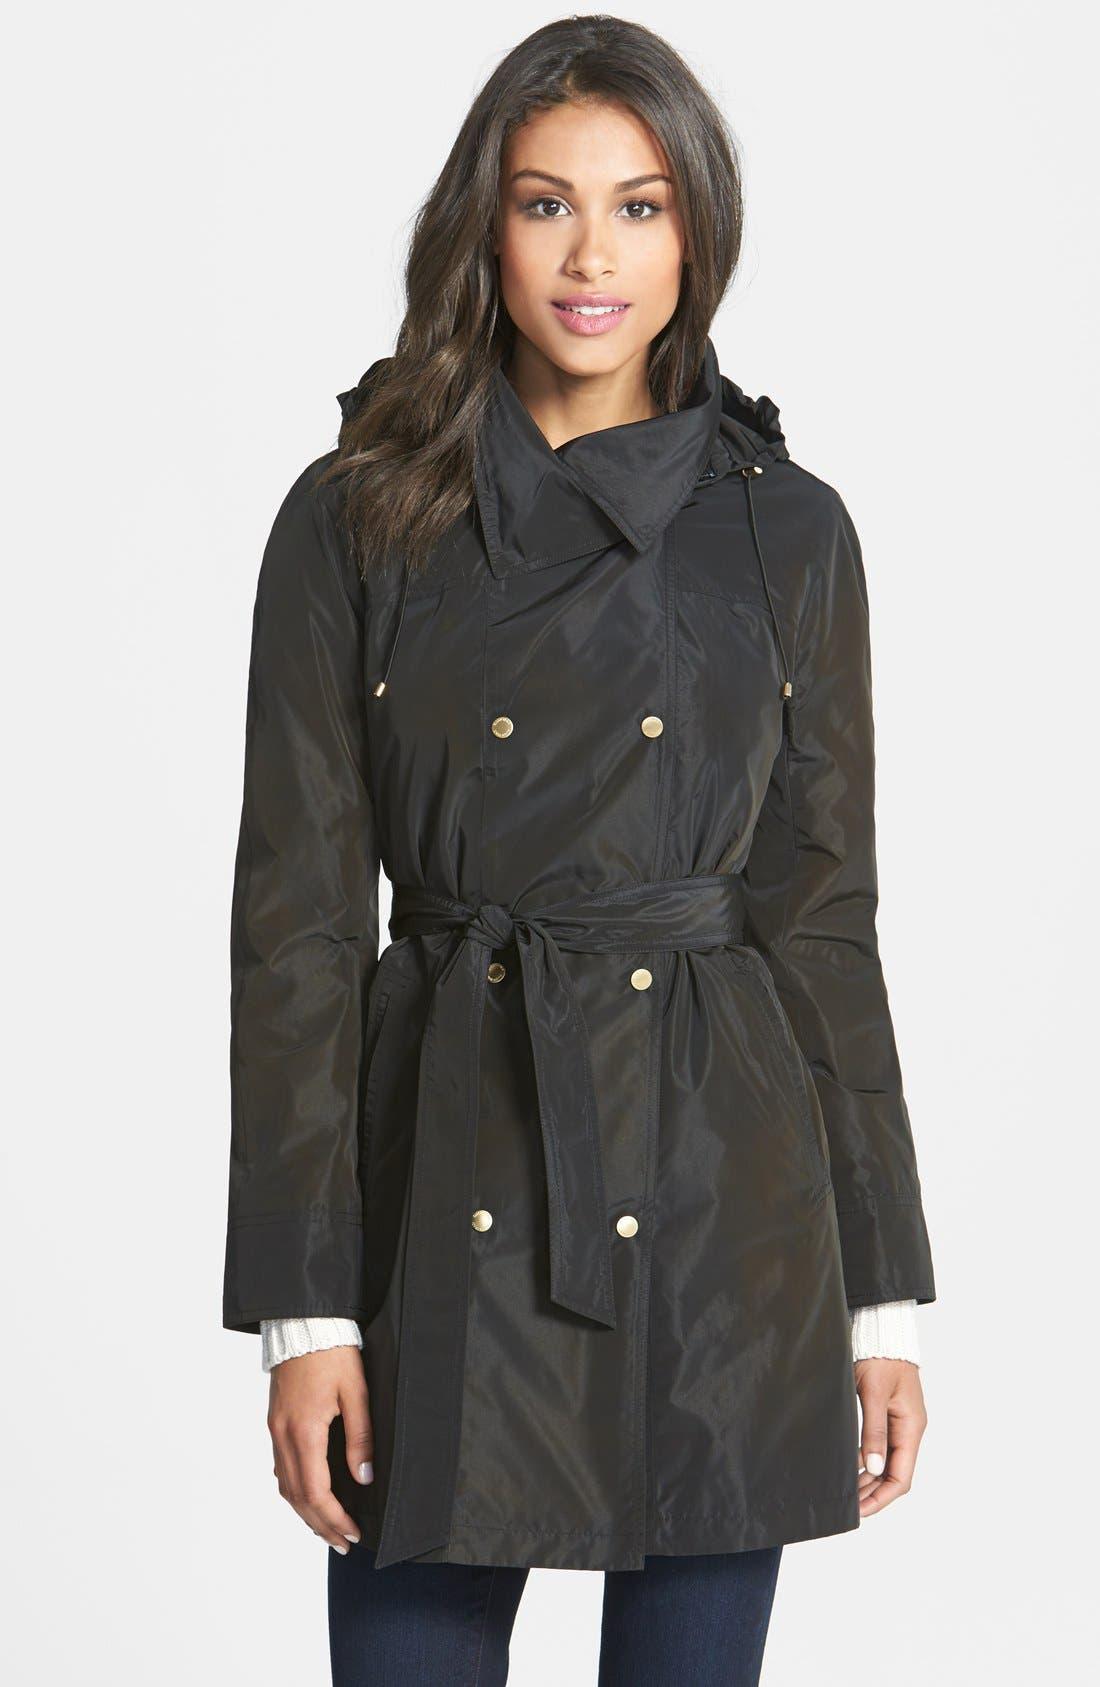 Alternate Image 1 Selected - Ellen Tracy Packable Belted Iridescent Raincoat